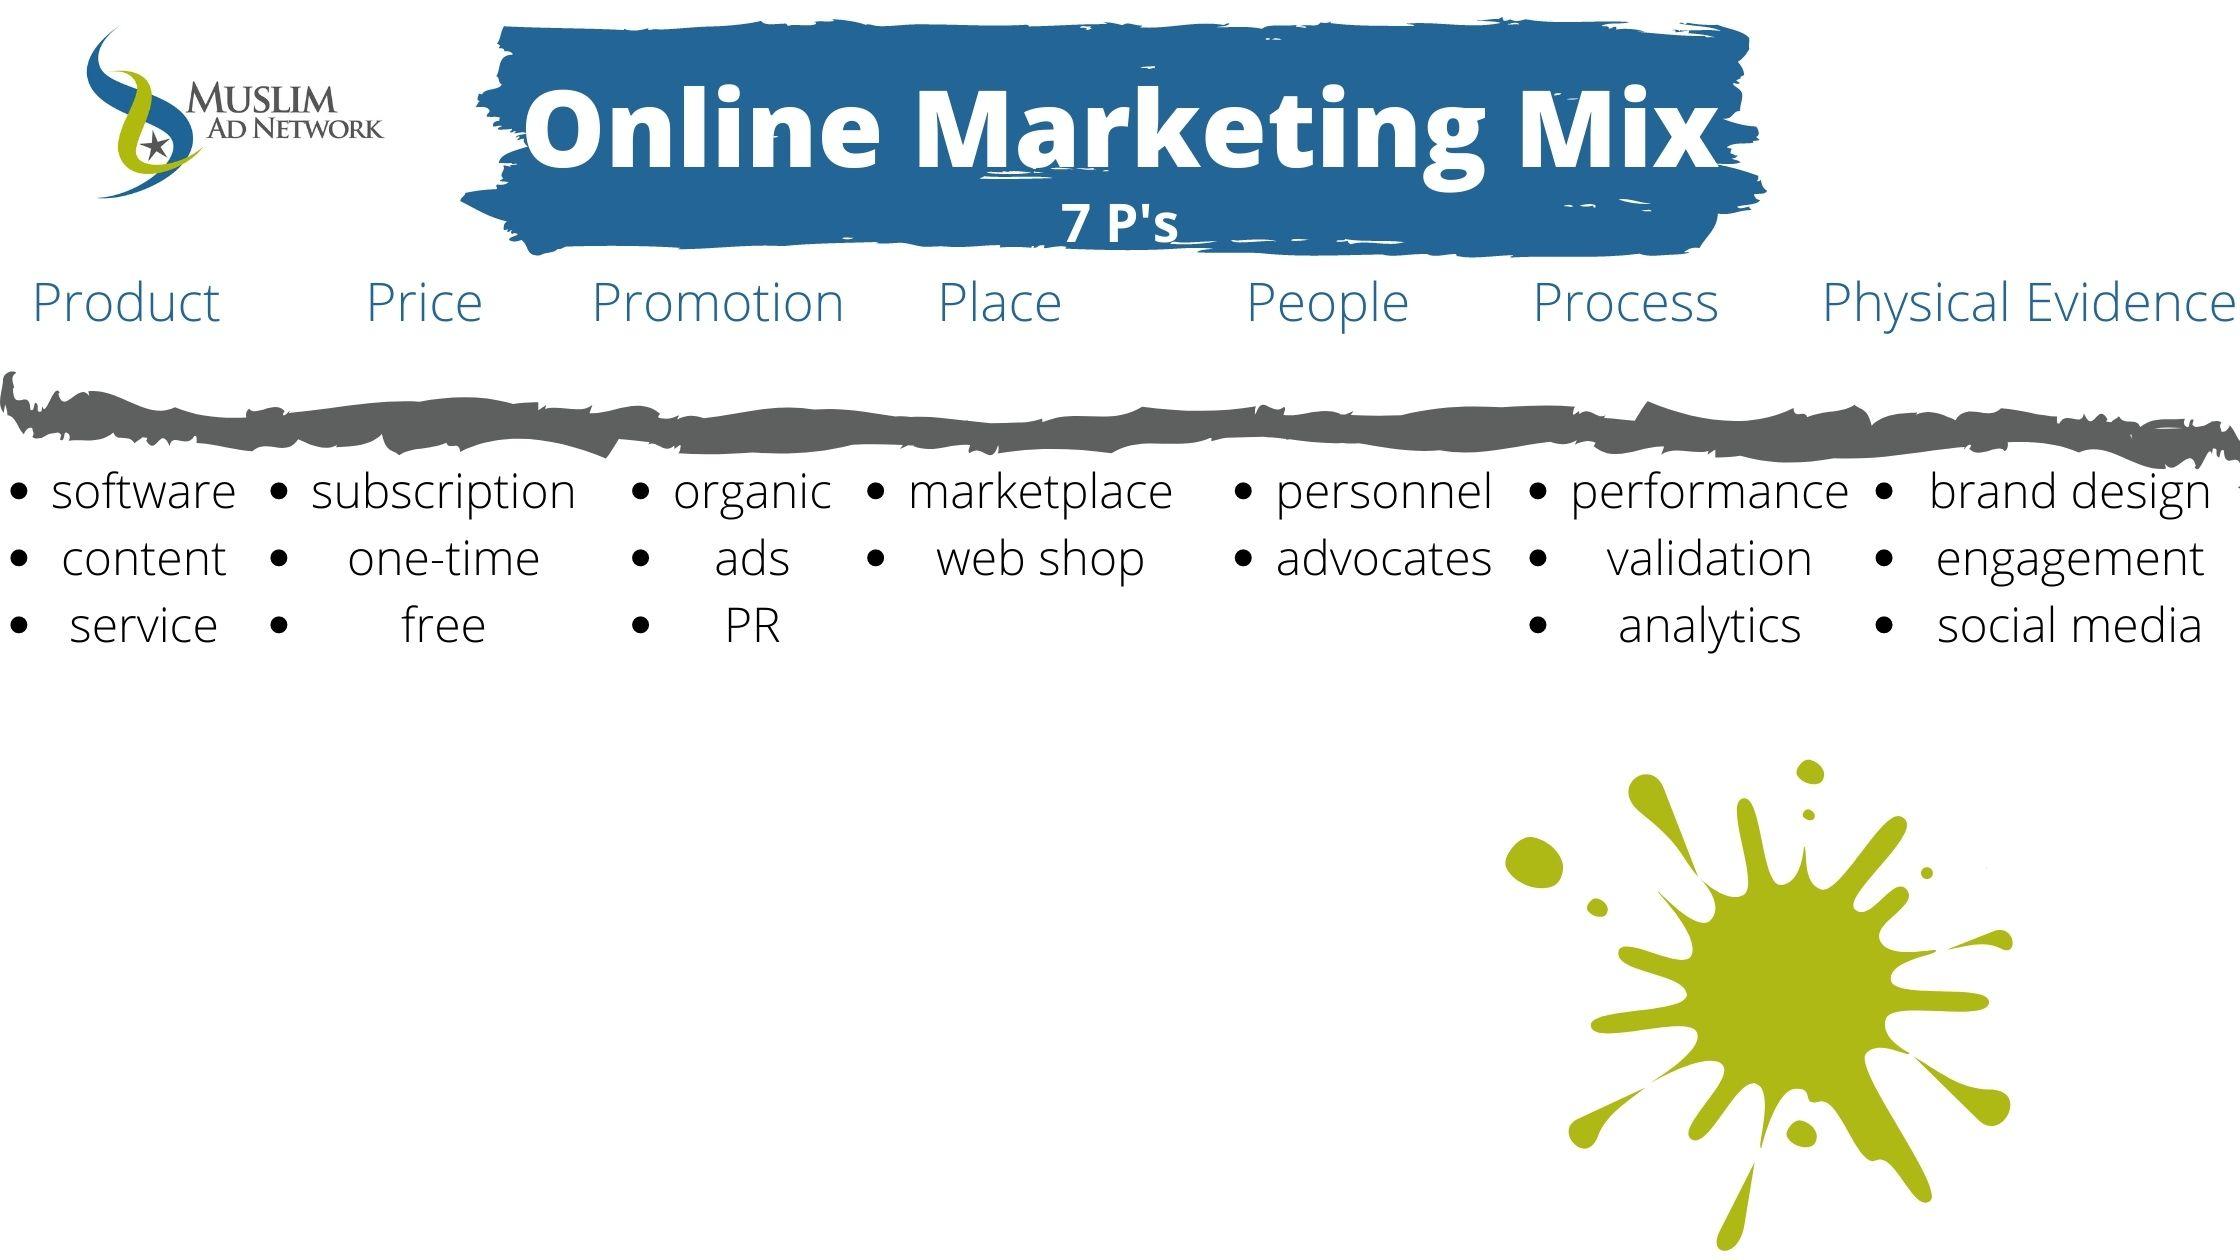 online marketing mix for halal business